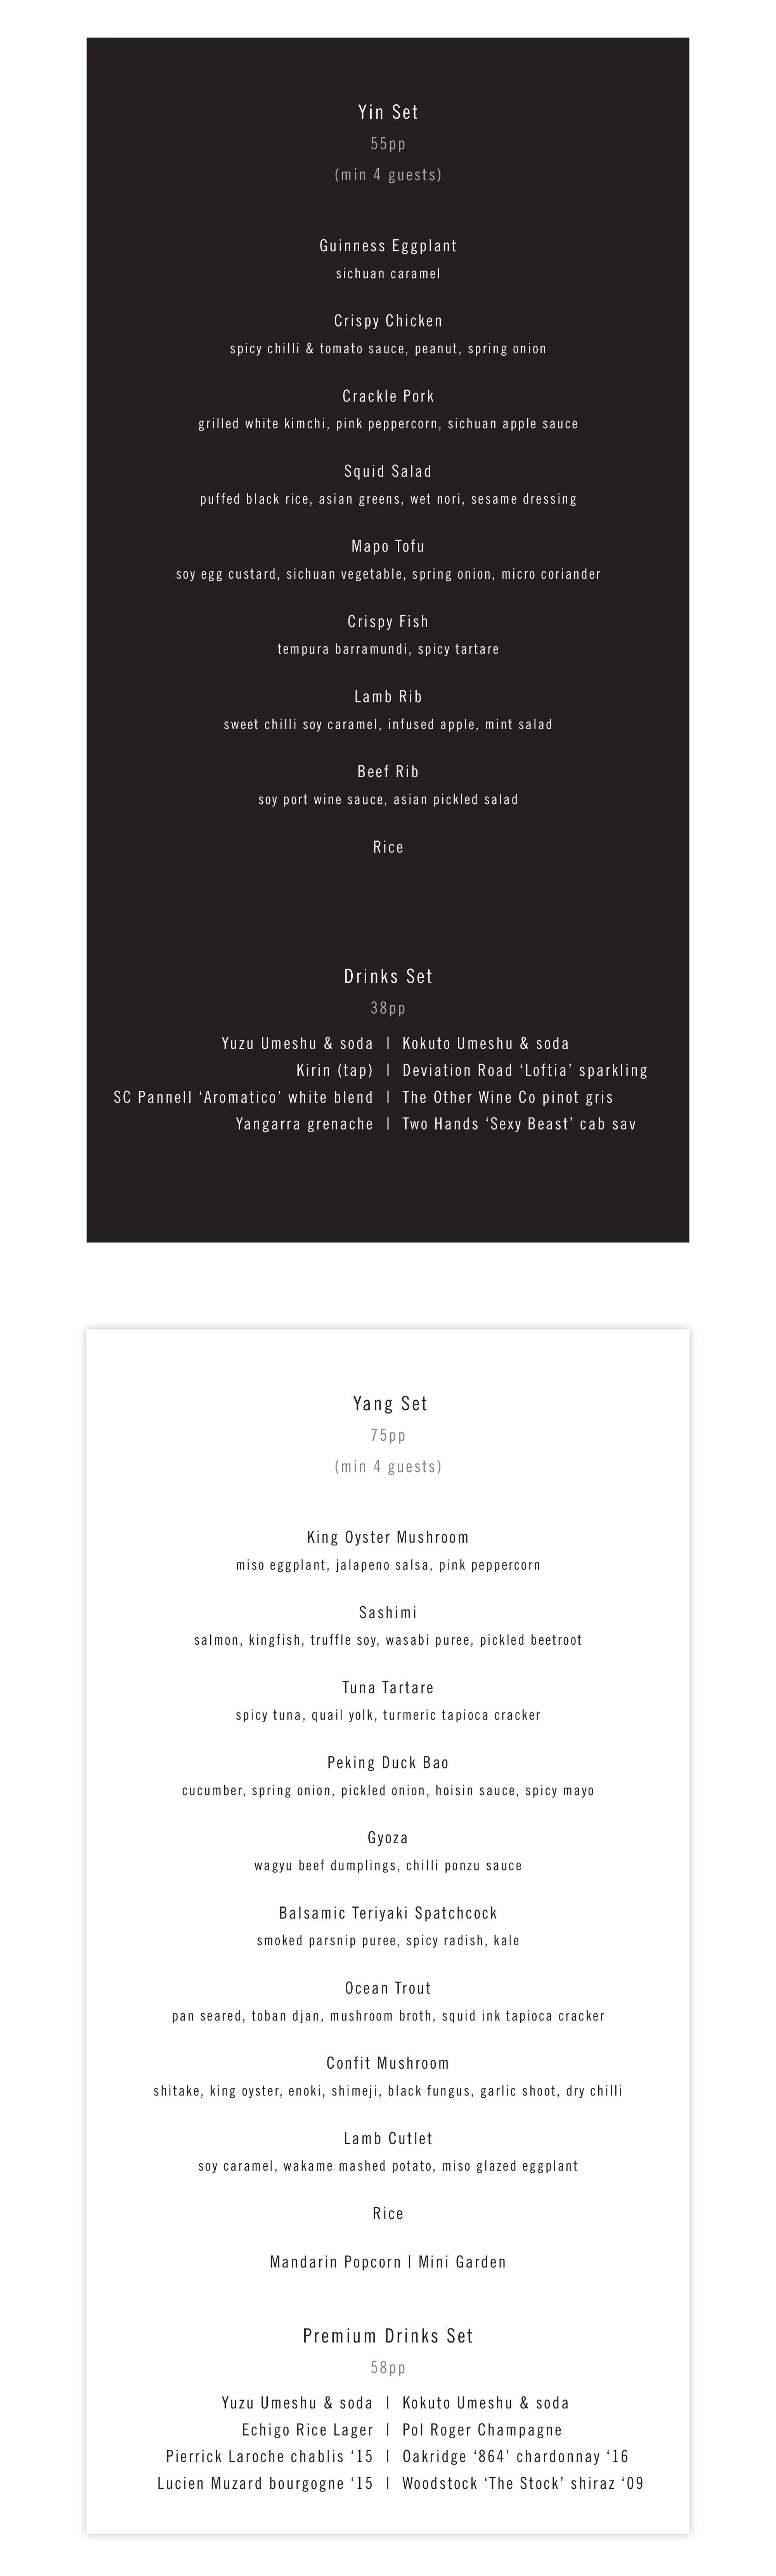 BL_WebsiteSetMenu_Sheet.jpg